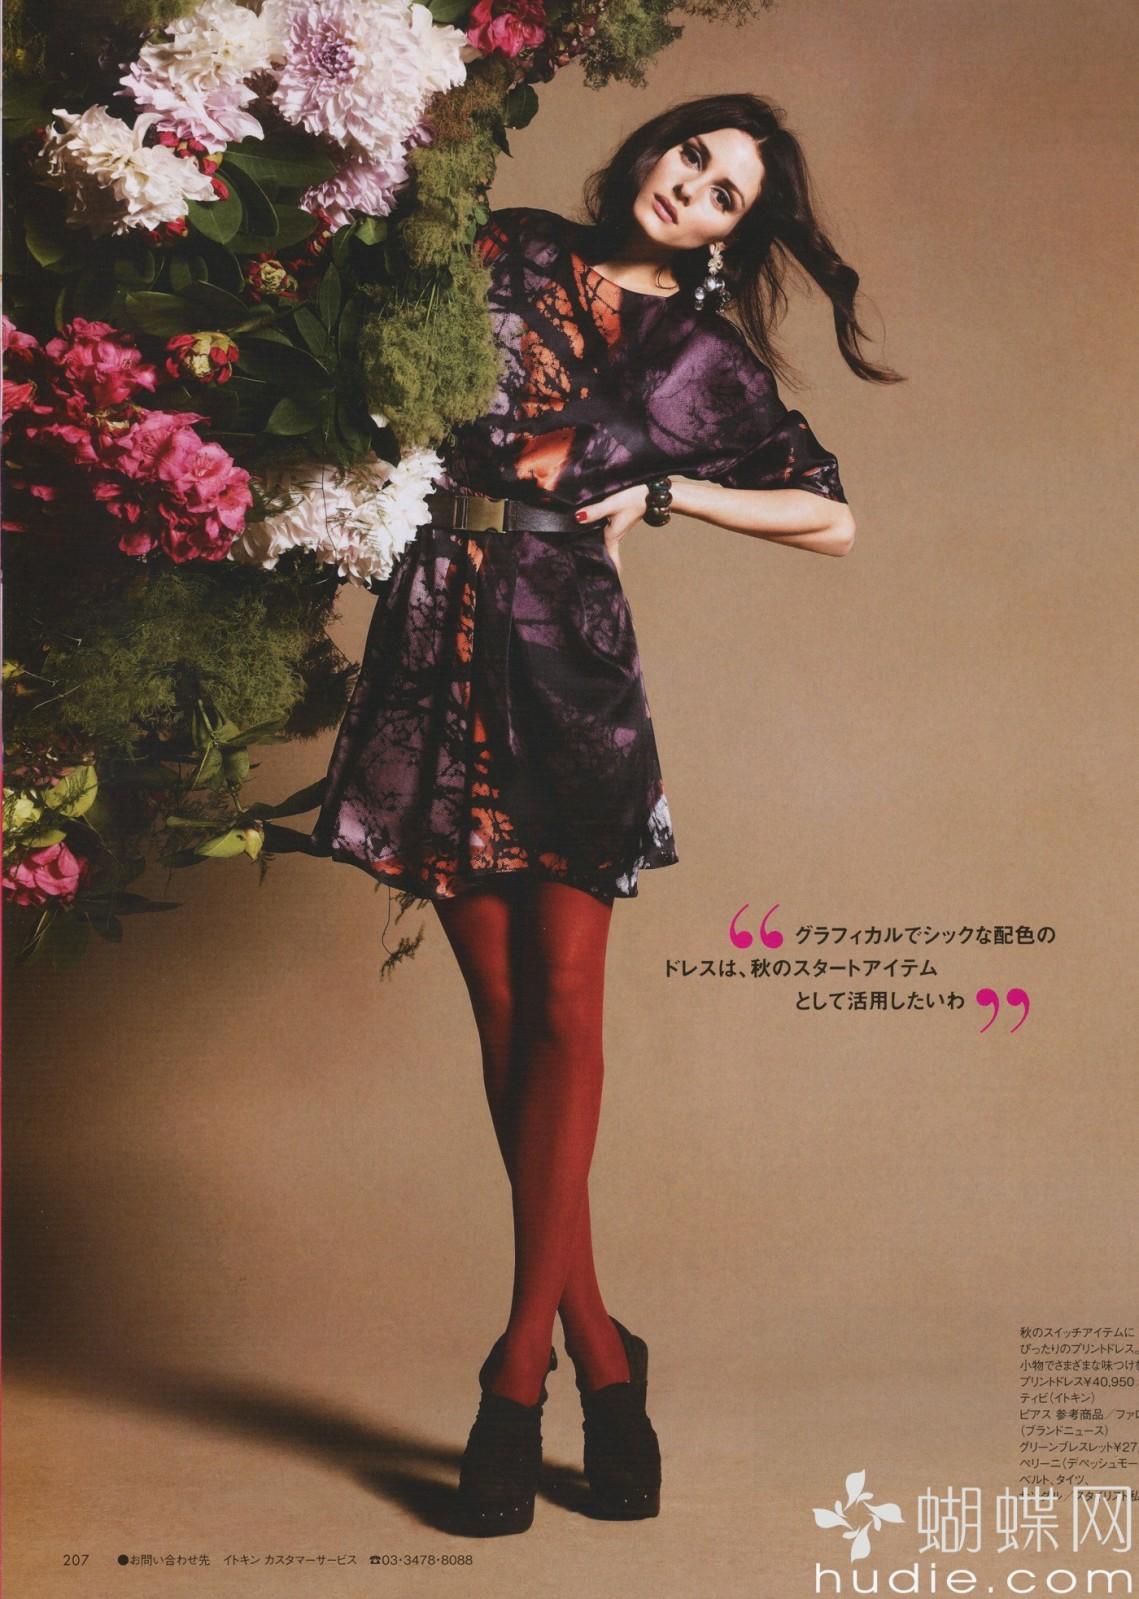 http://2.bp.blogspot.com/_GgQtqLiRv-8/TKHKHmKQAtI/AAAAAAAAxfM/NkD8uo5yDhM/s1600/Olivia-Elle-Japan-3.jpg